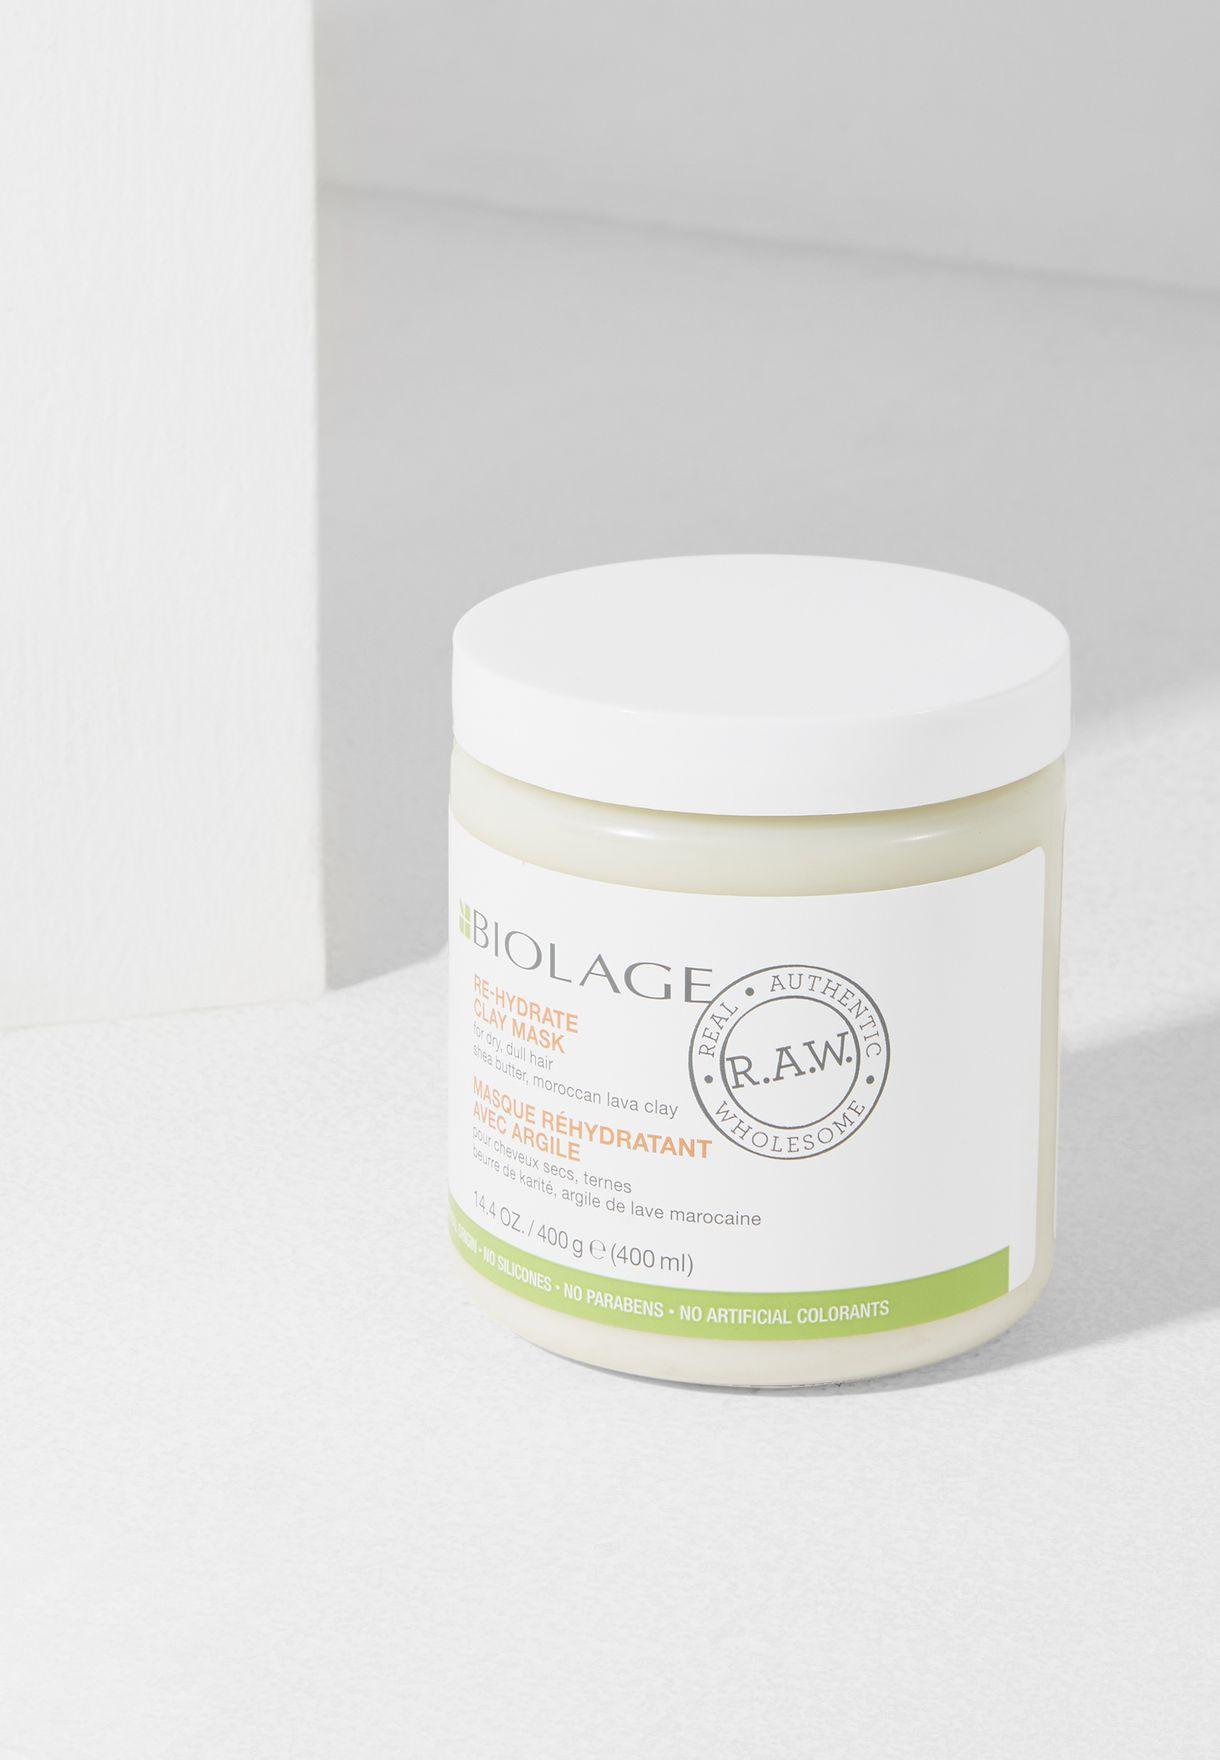 Biolage RAW Re-Hydrate Mask 400ml